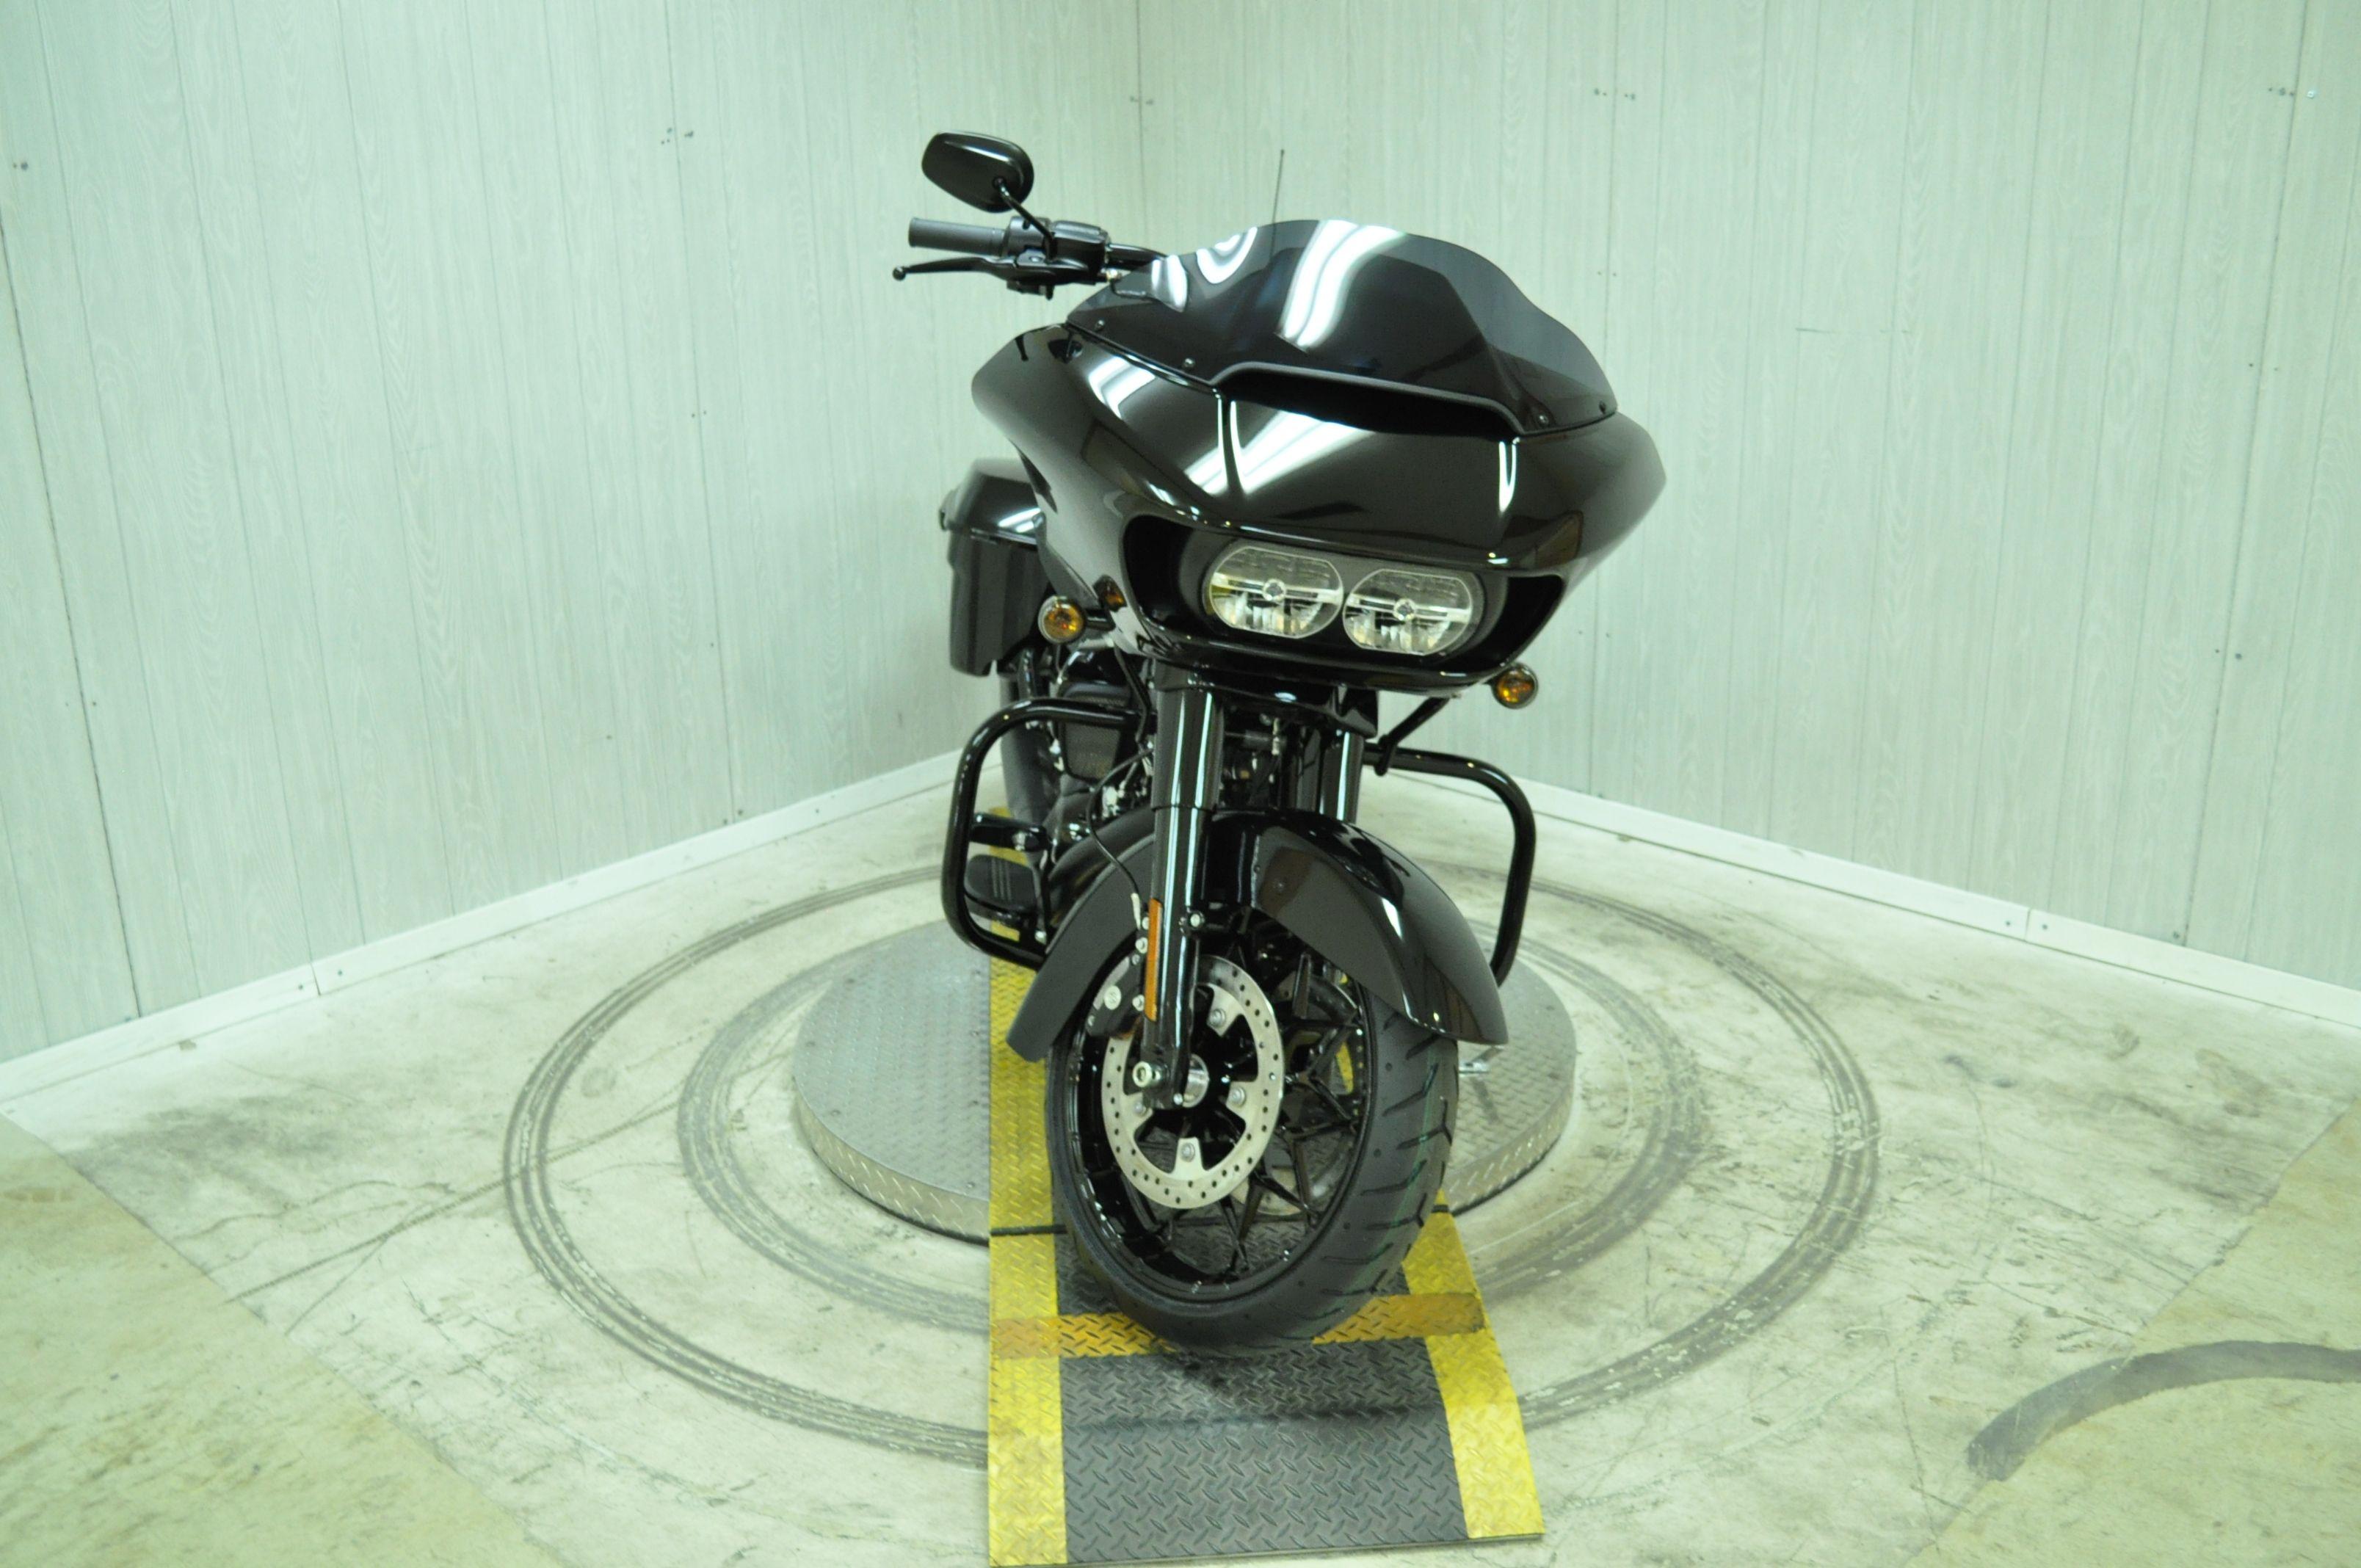 New 2020 Harley-Davidson Road Glide Special FLTRXS